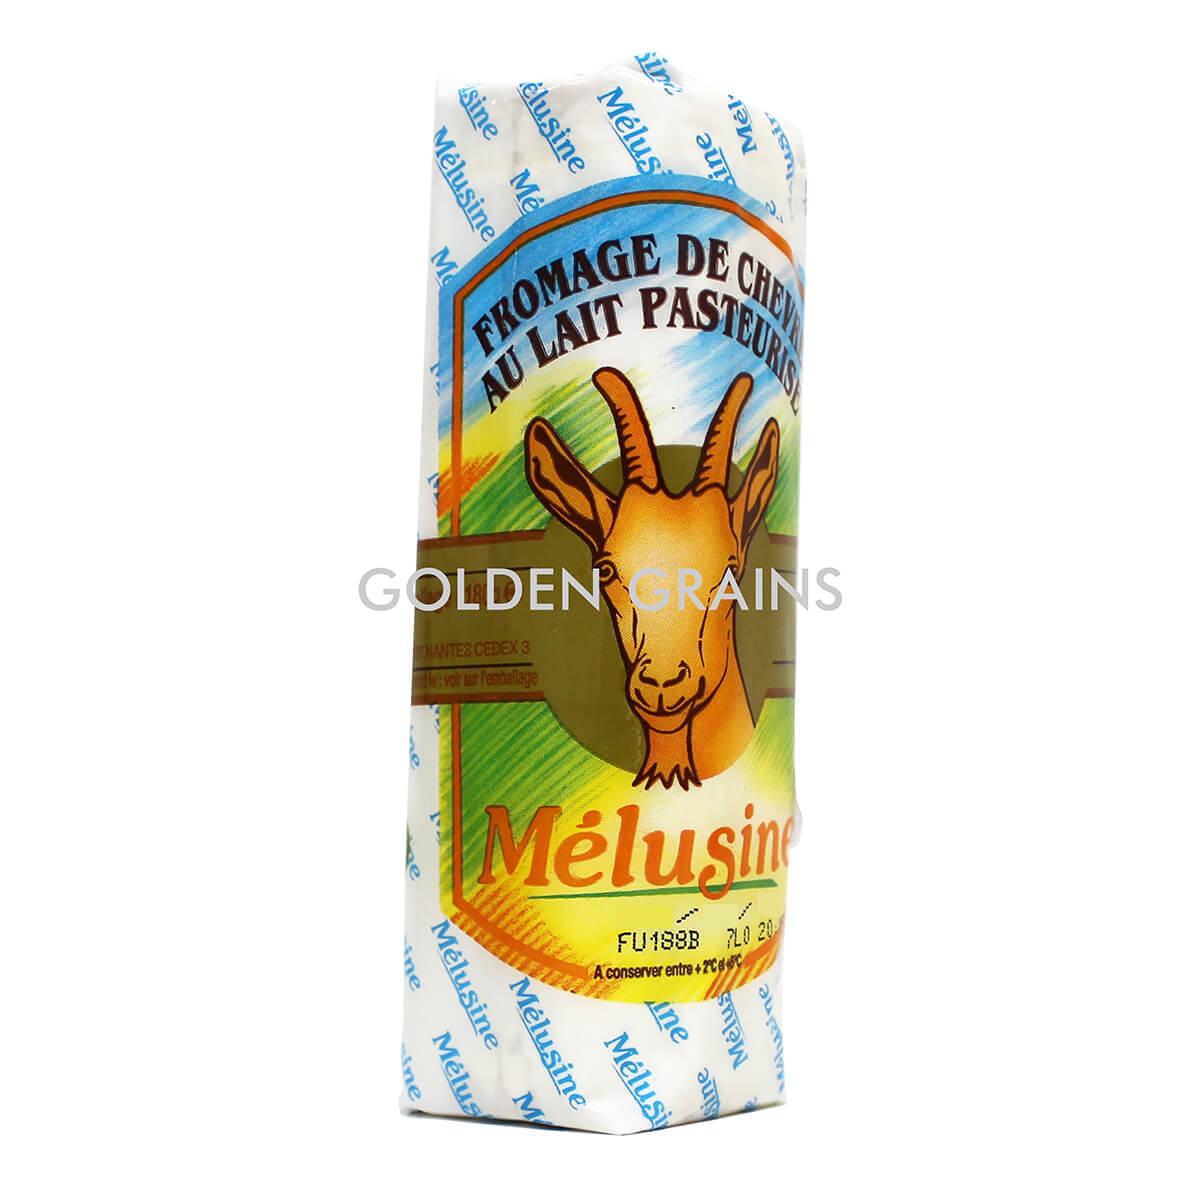 Melusine Goat Cheese